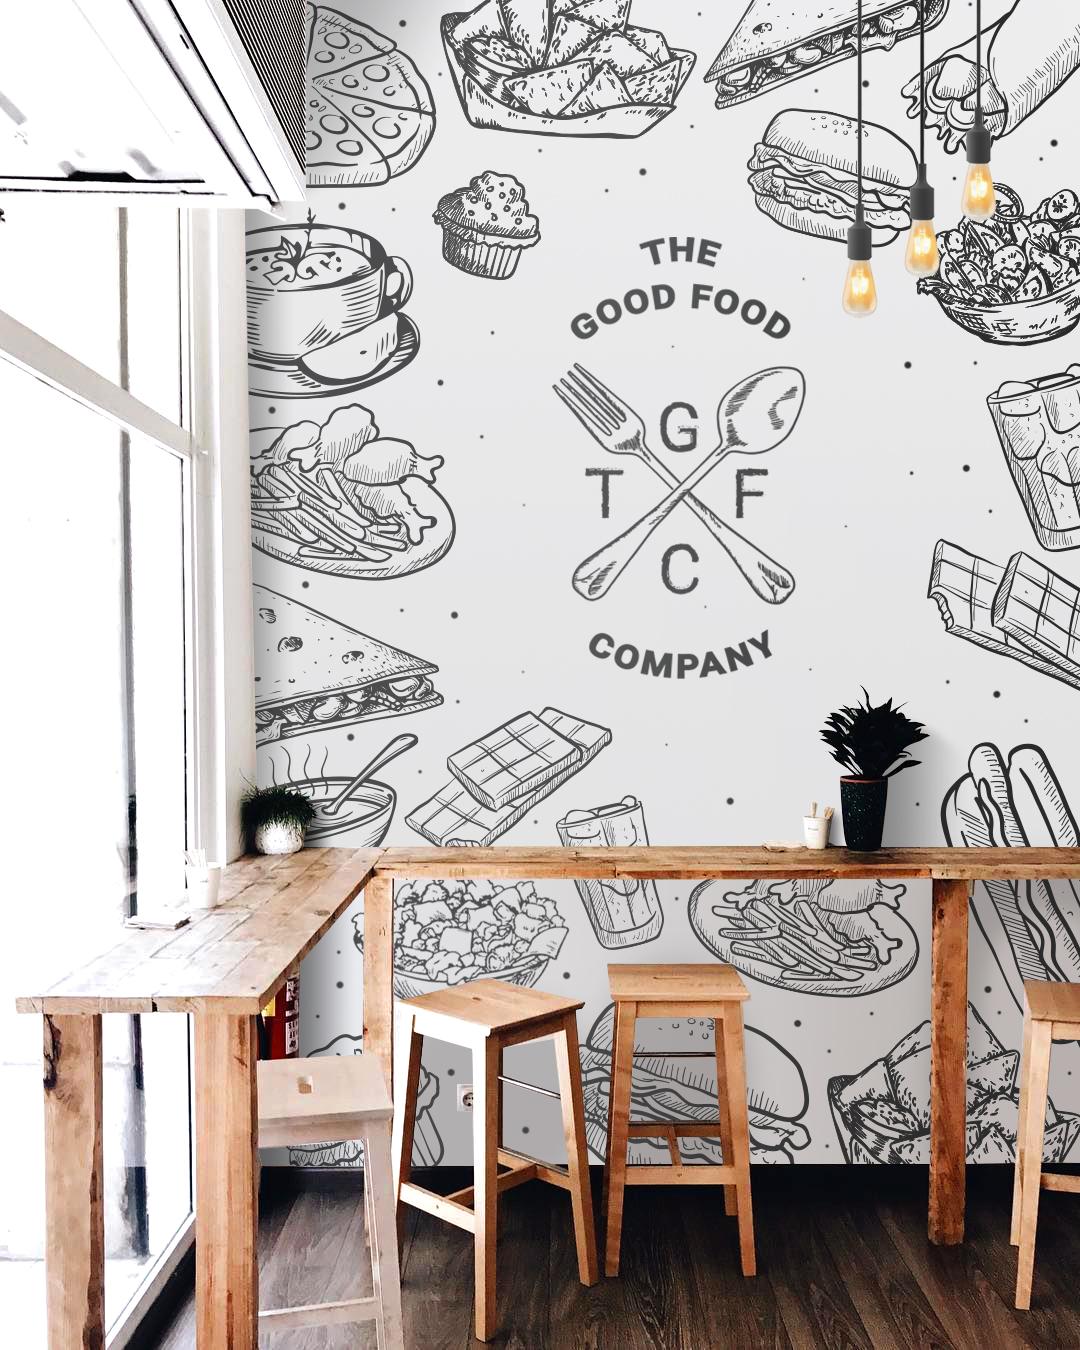 78 Design Creates The Good Food Company's Brand Identity